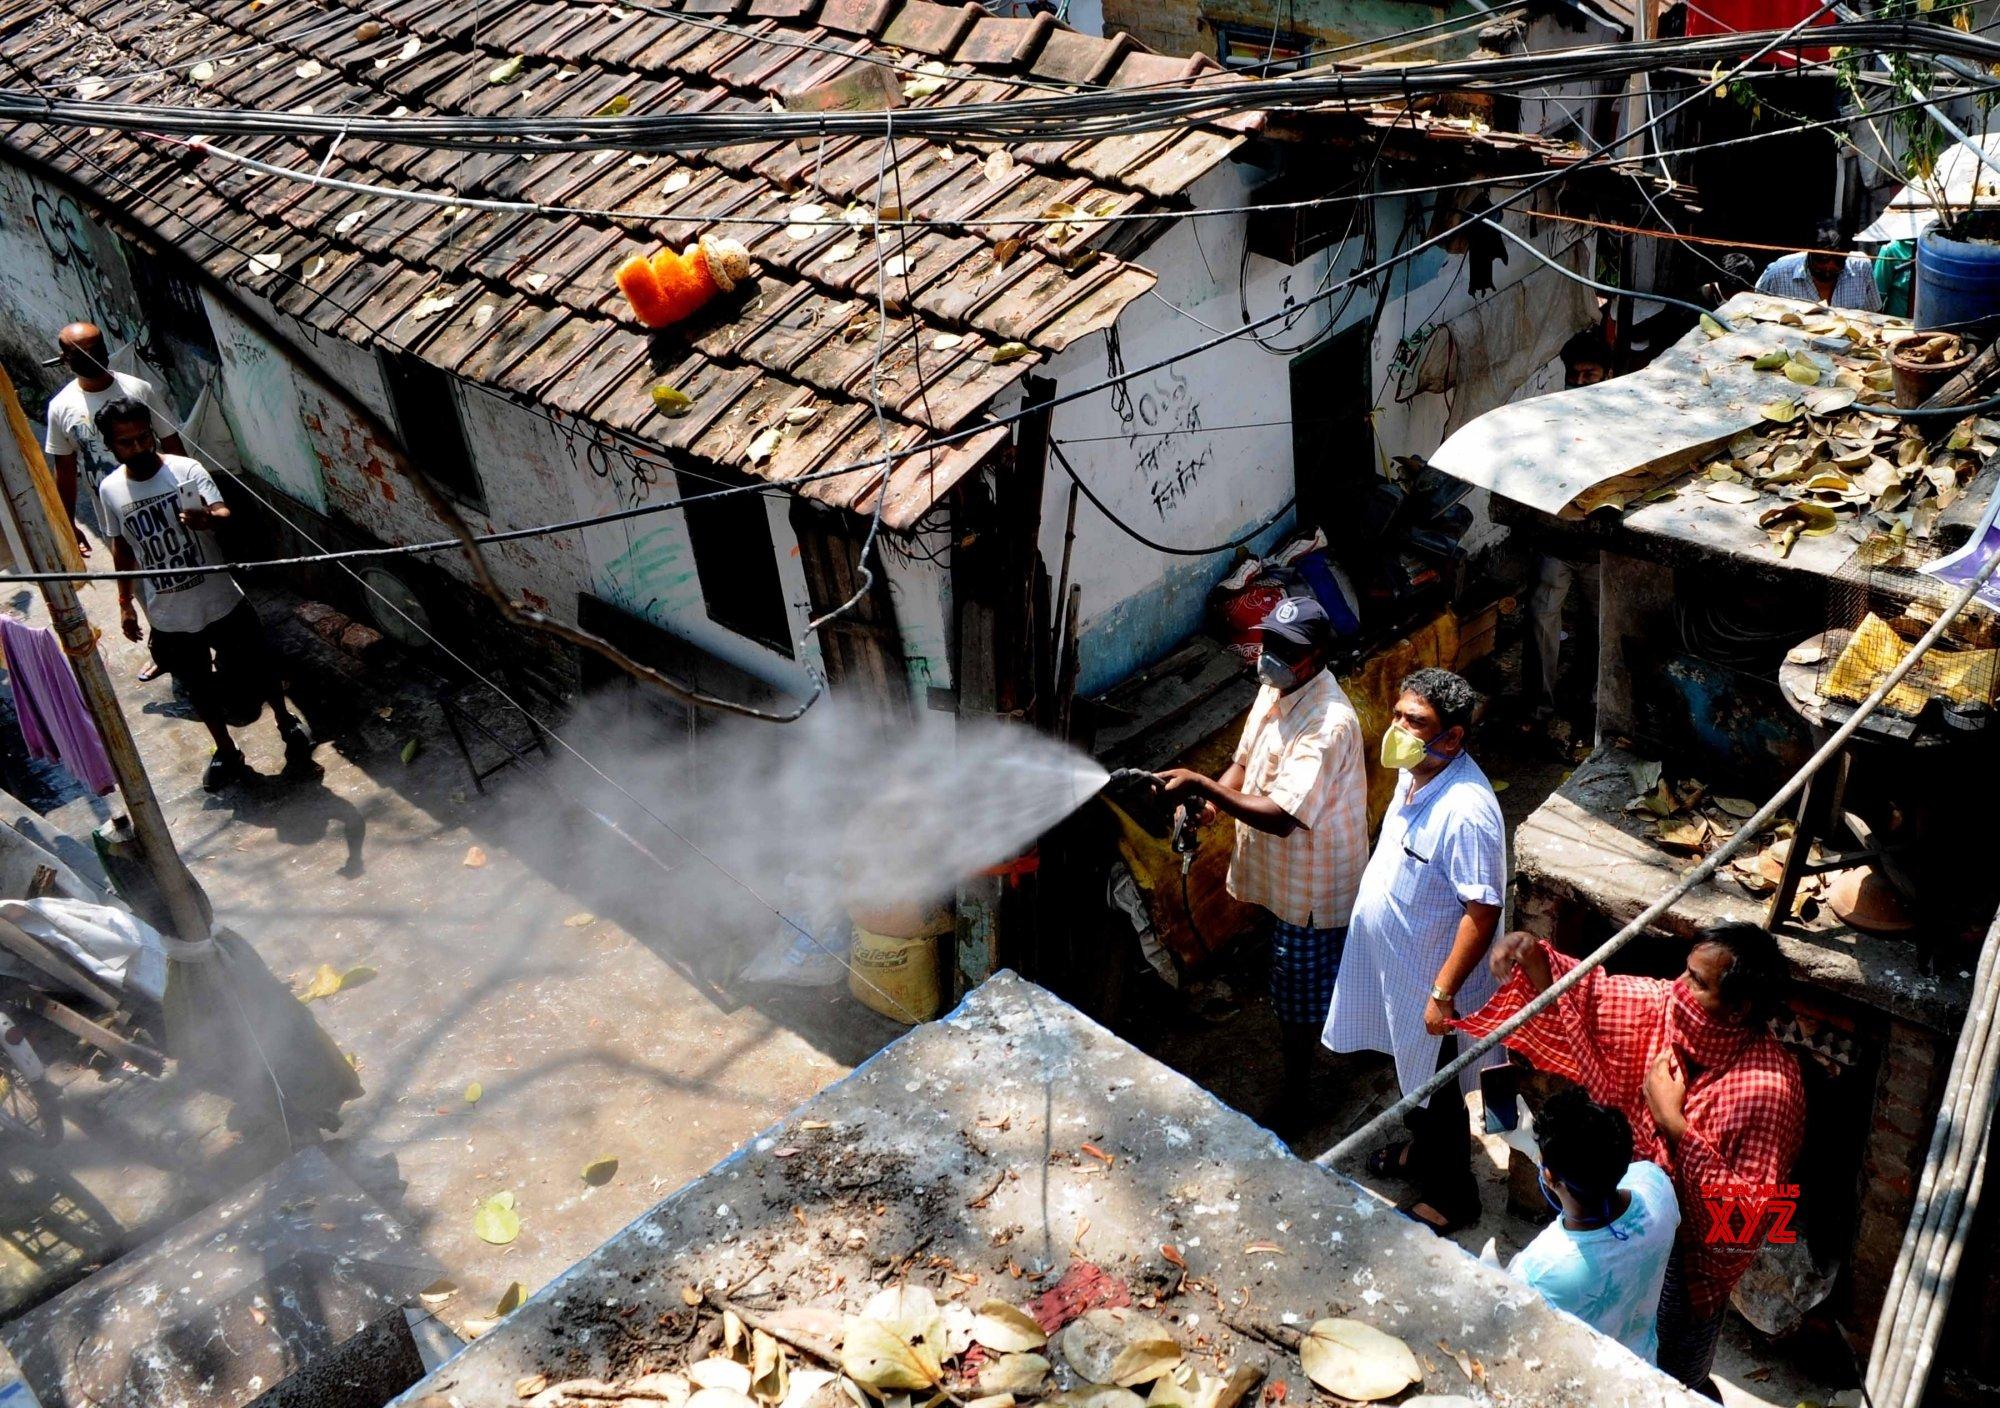 Kolkata: City being disinfected amid lockdown #Gallery